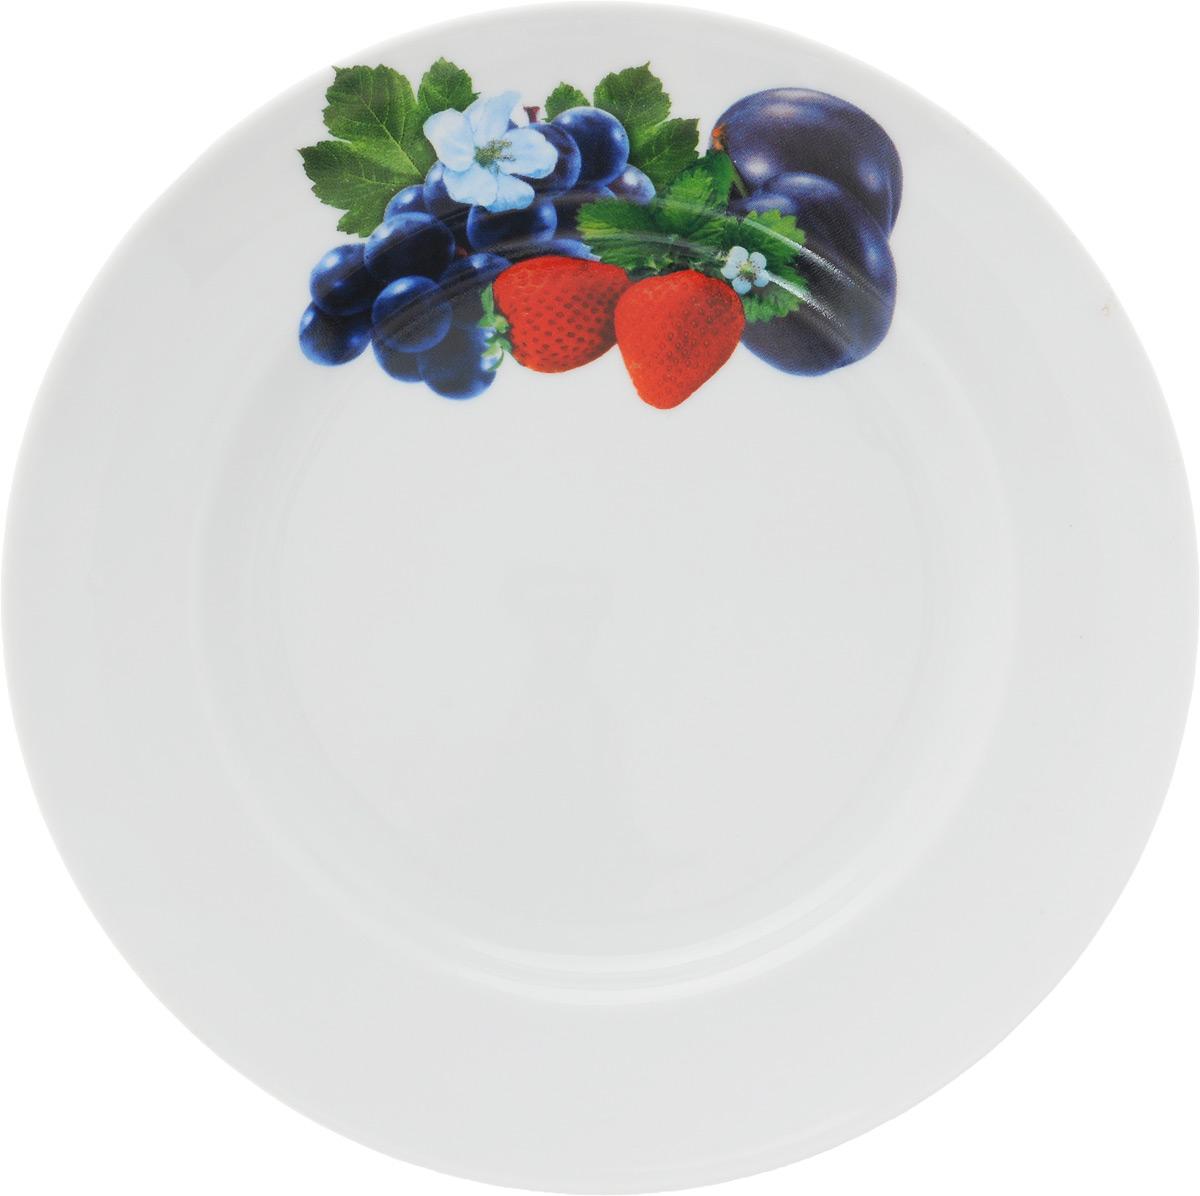 Тарелка мелкая Идиллия. Слива, клубника, диаметр 20 см1303841_слива, клубника